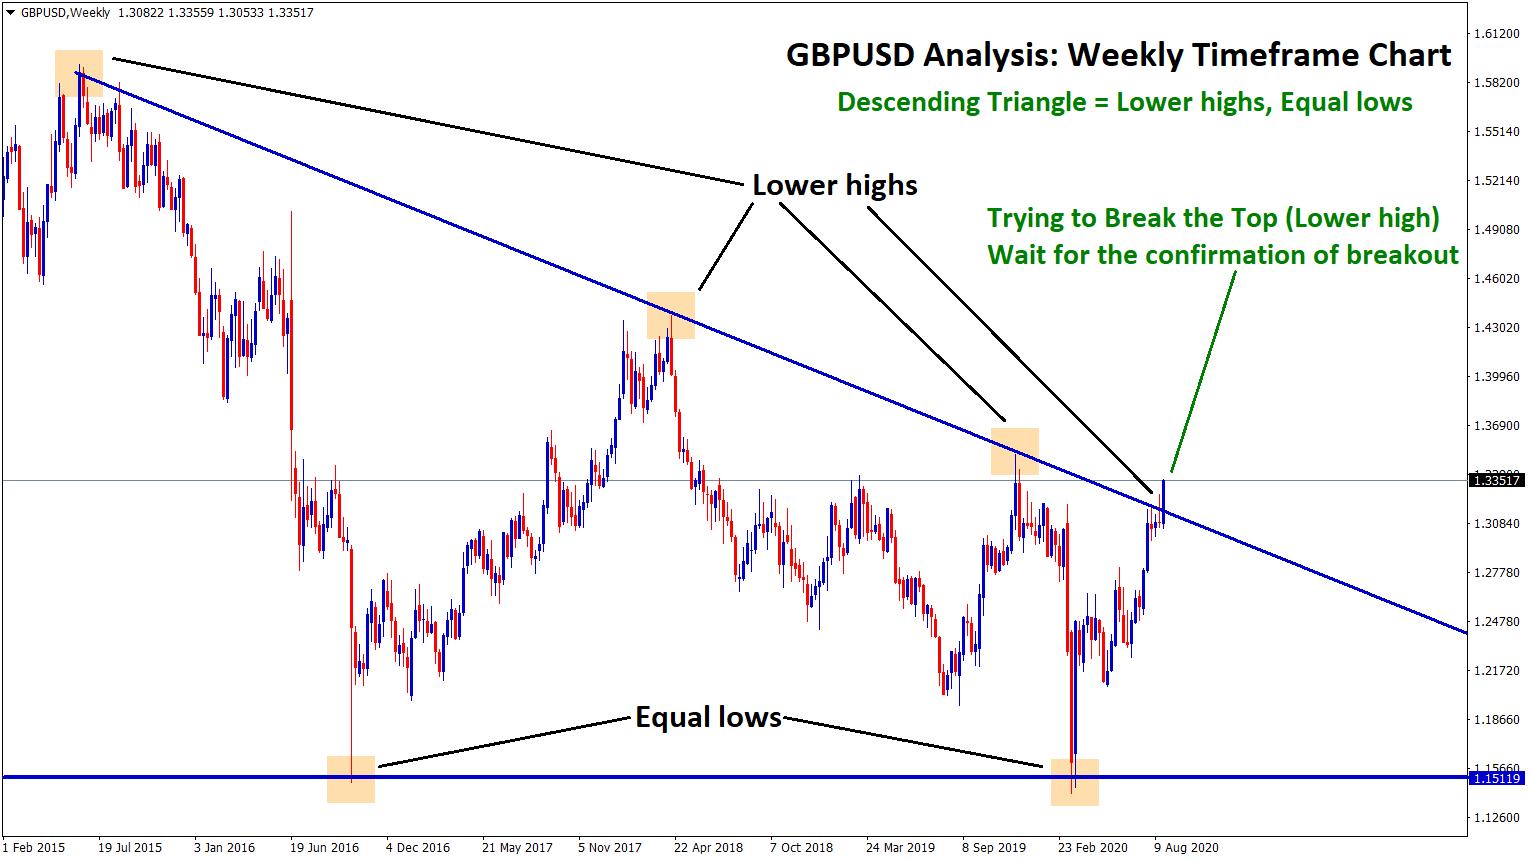 GBPUSD descending triangle going to break